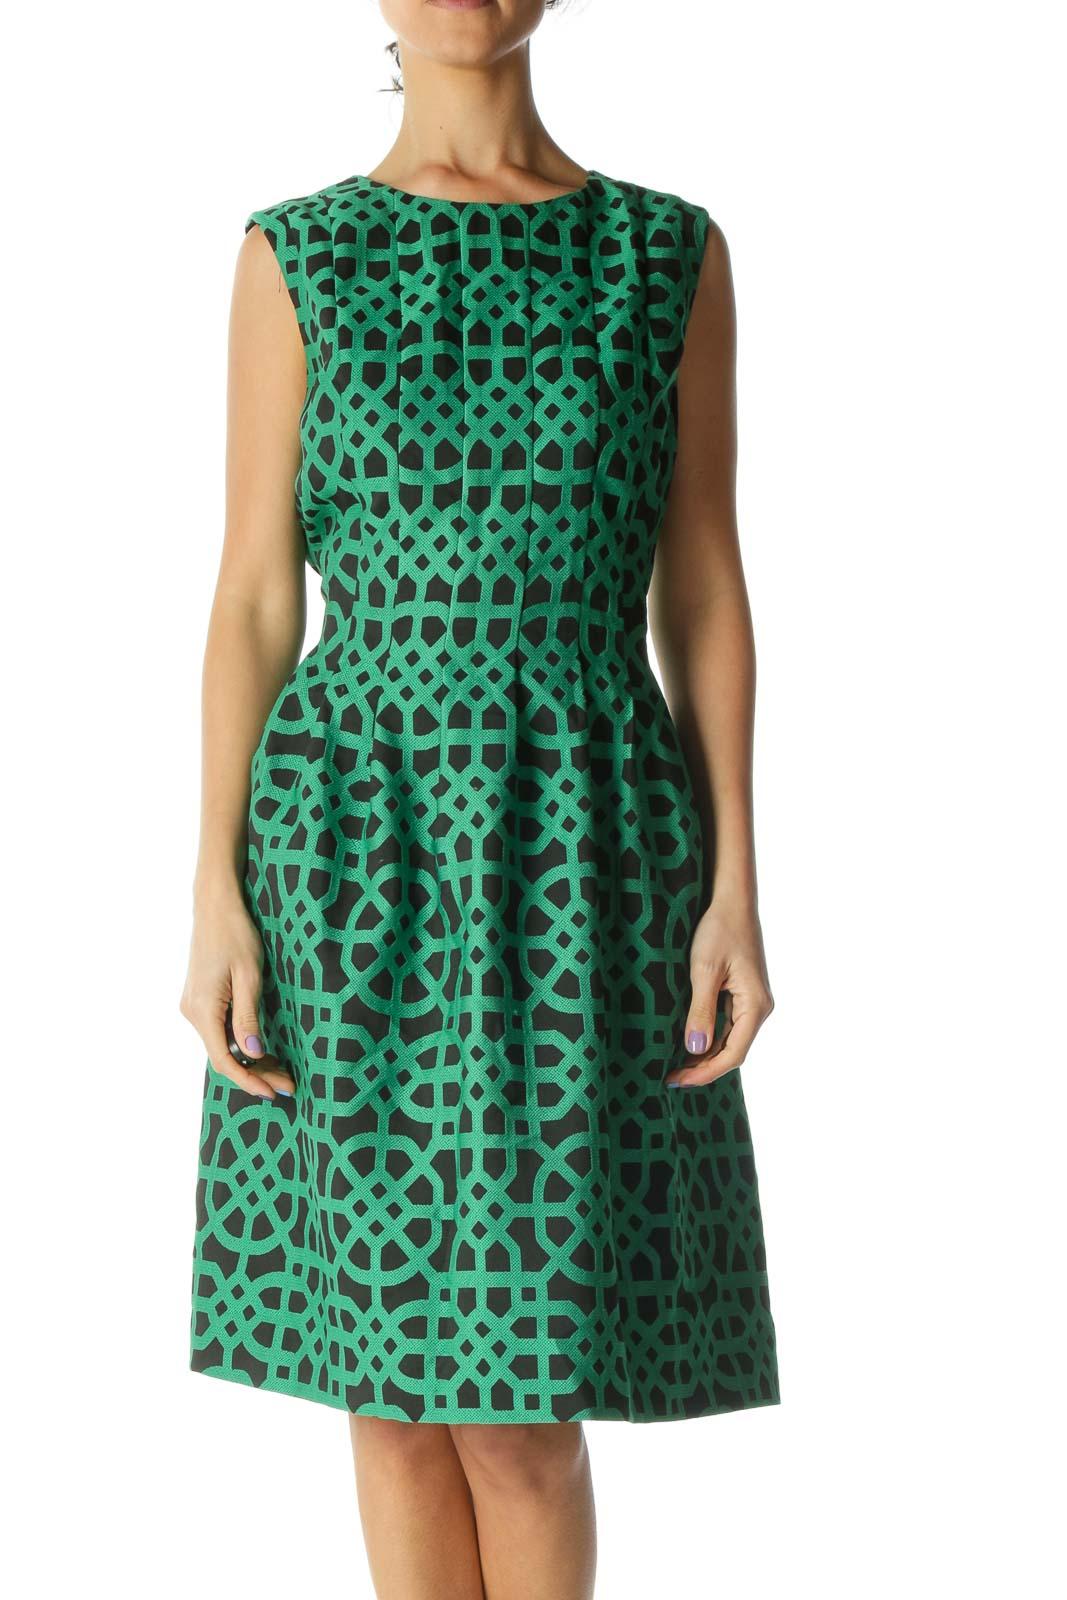 Green Black Pleated Dress